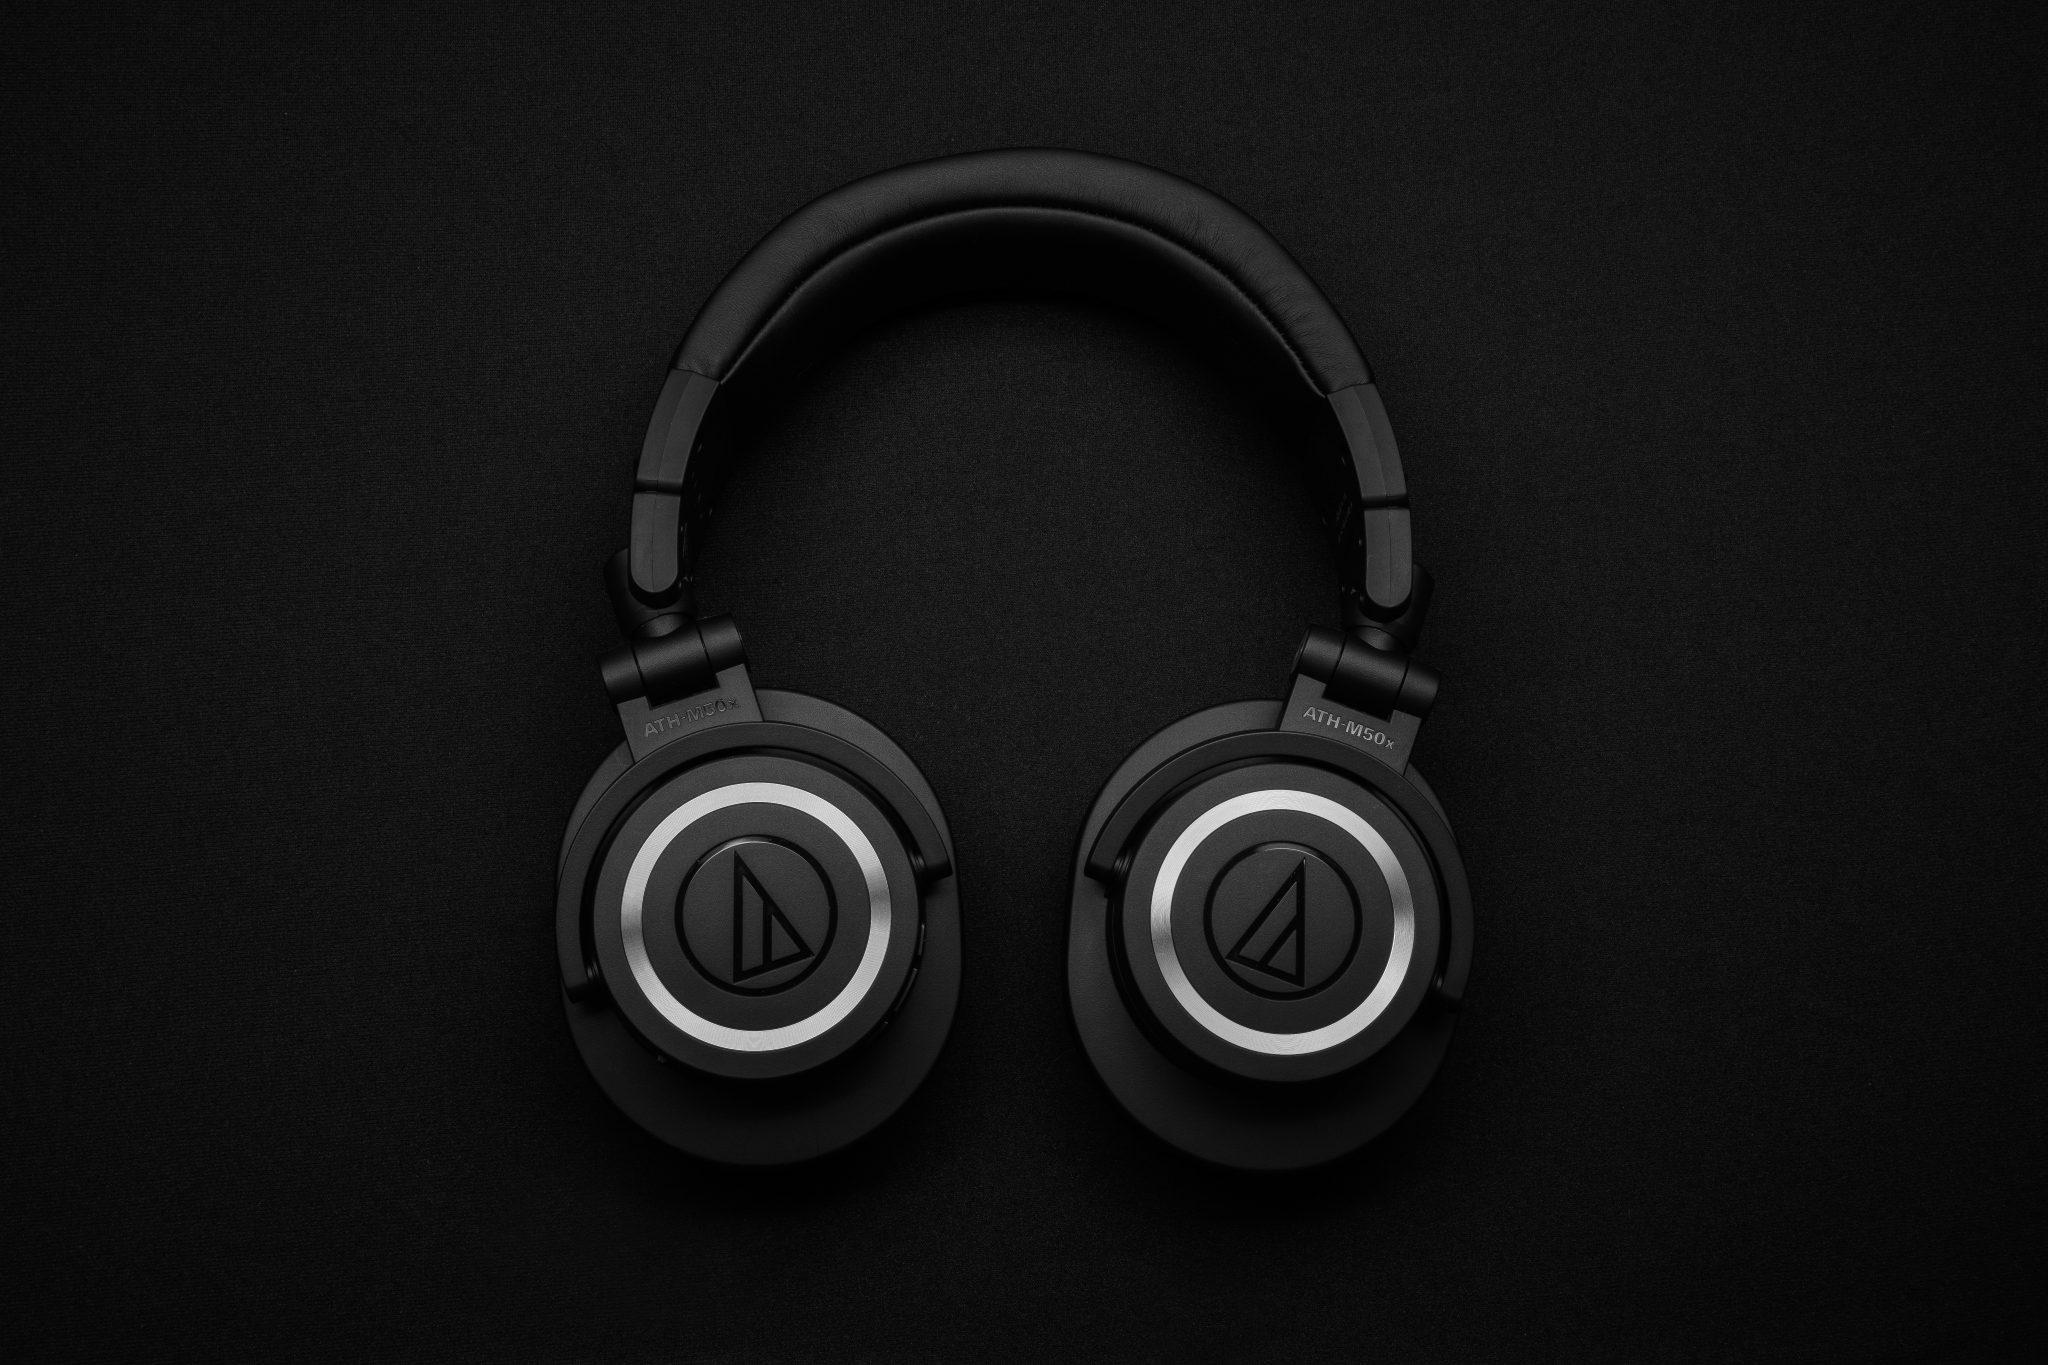 mono headphones for hearing impaired